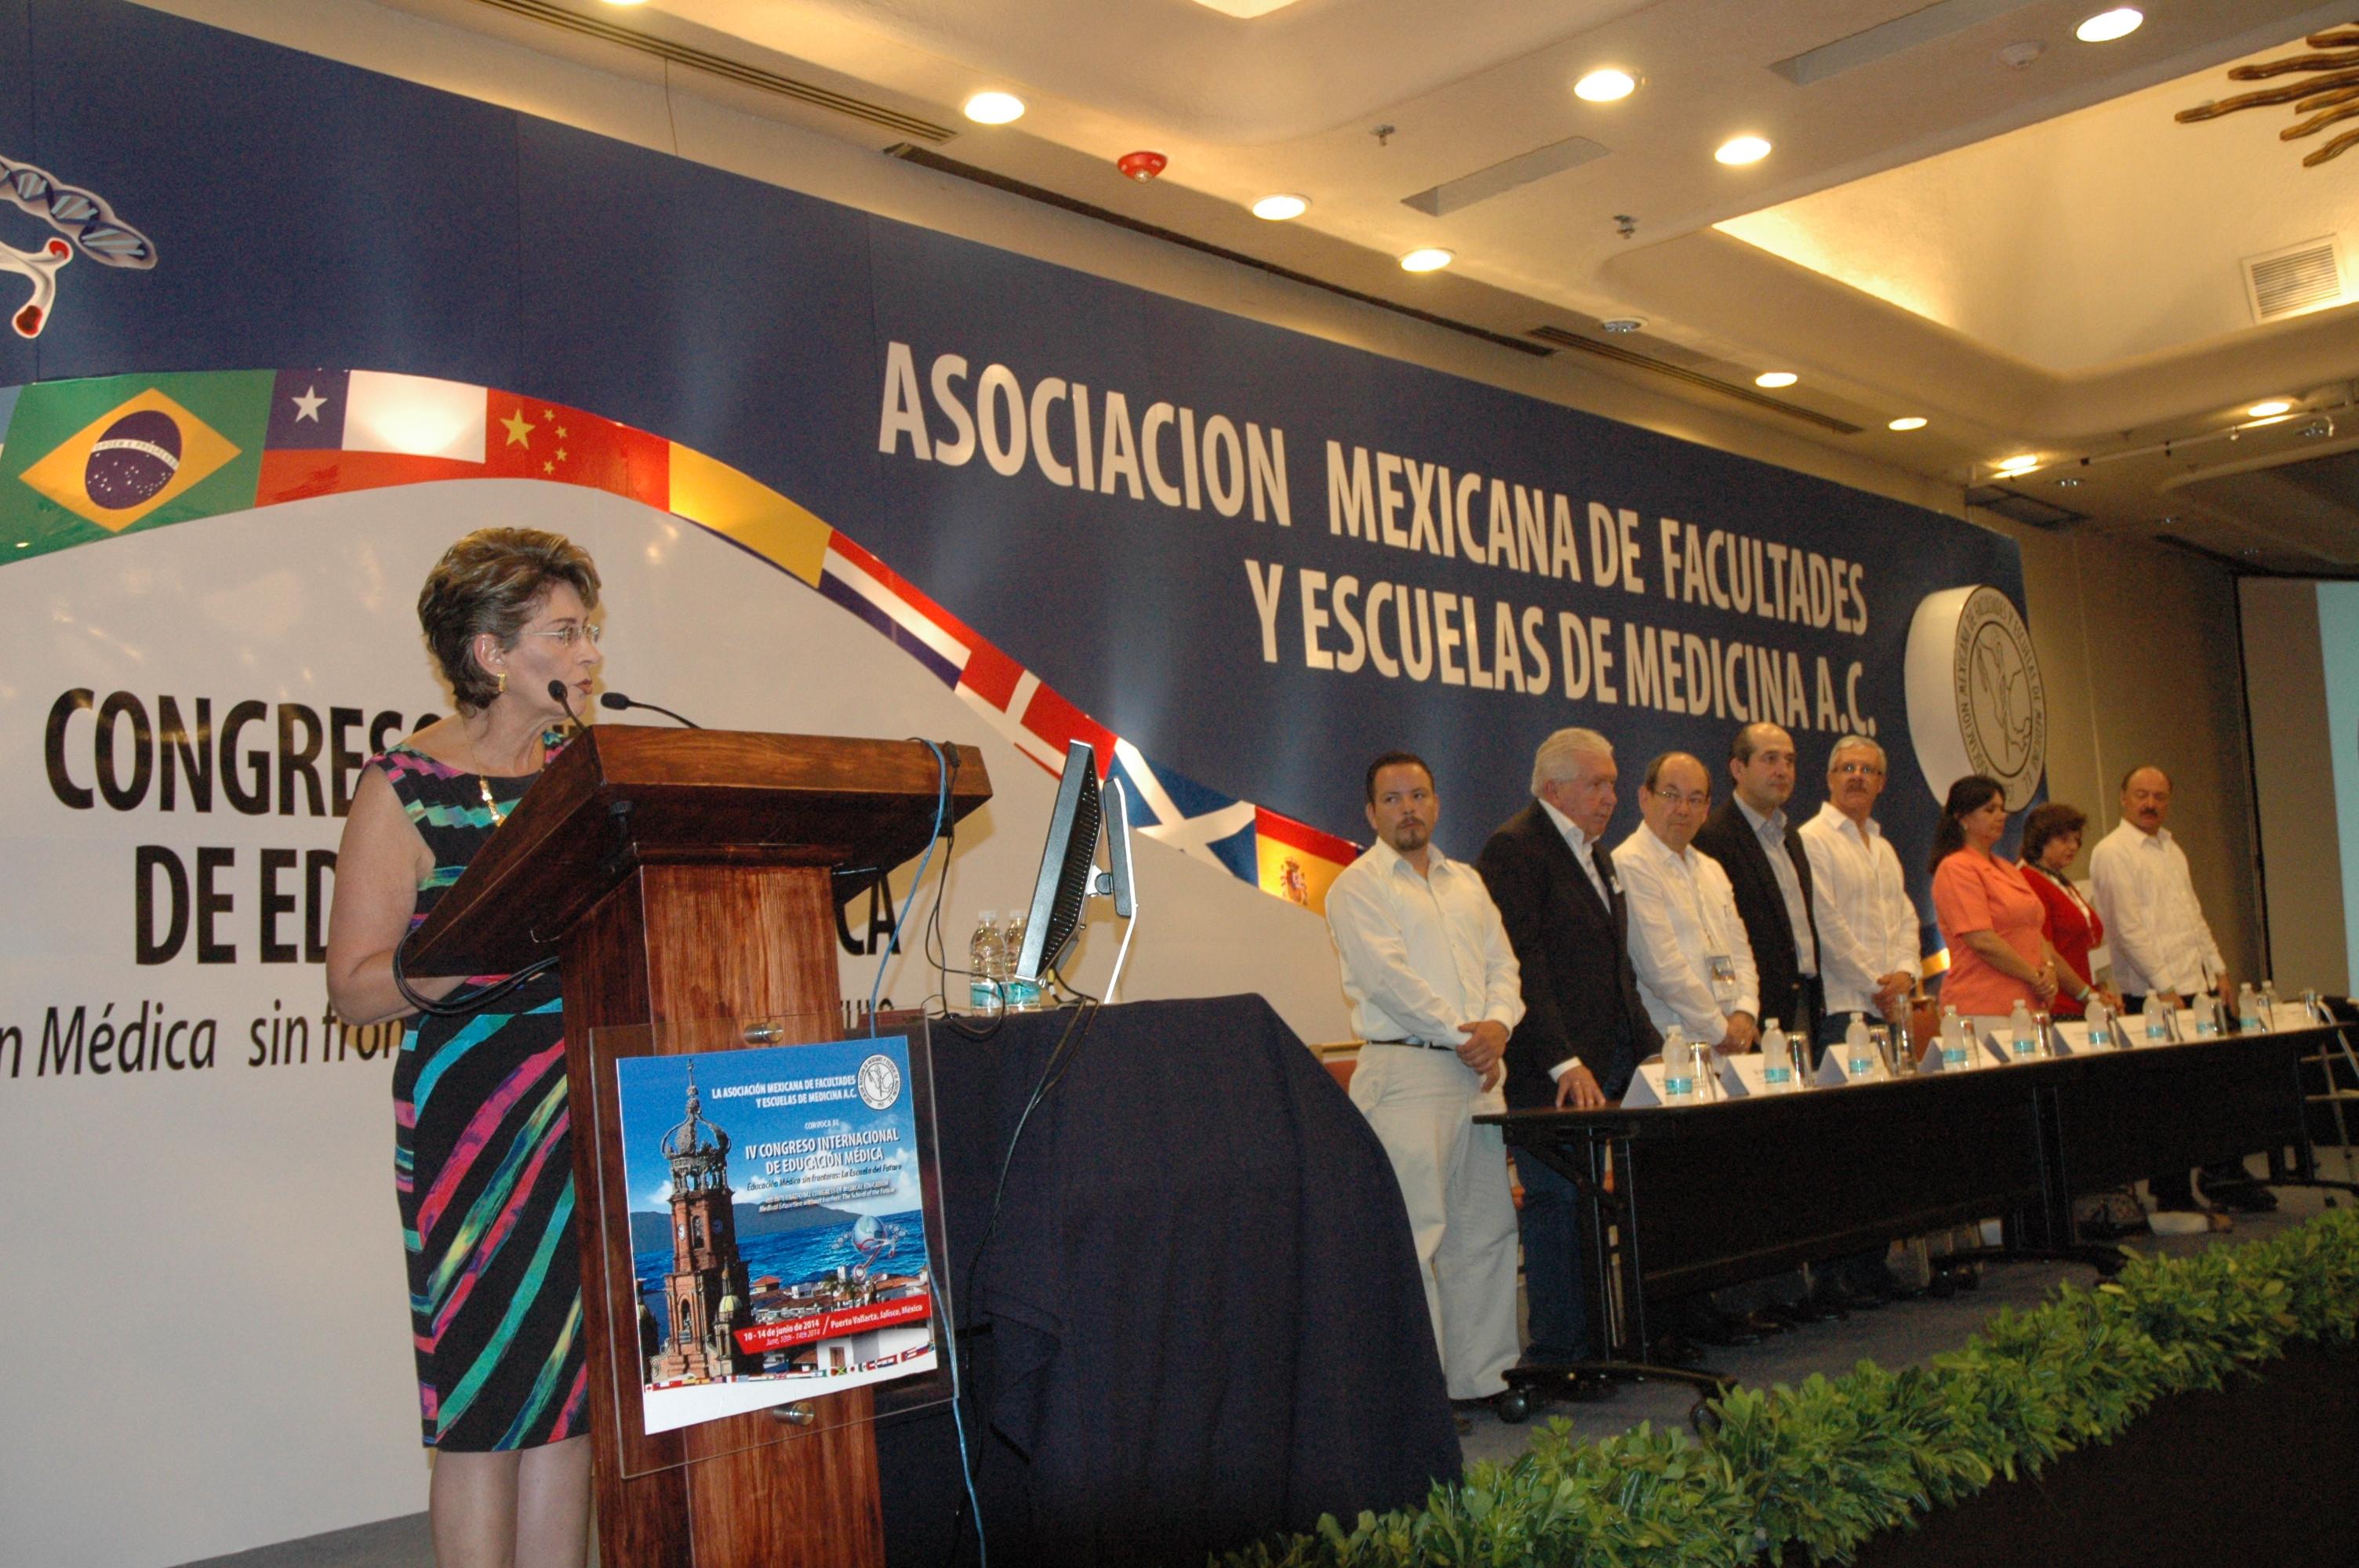 IV Congreso Internacional de Educación Médica